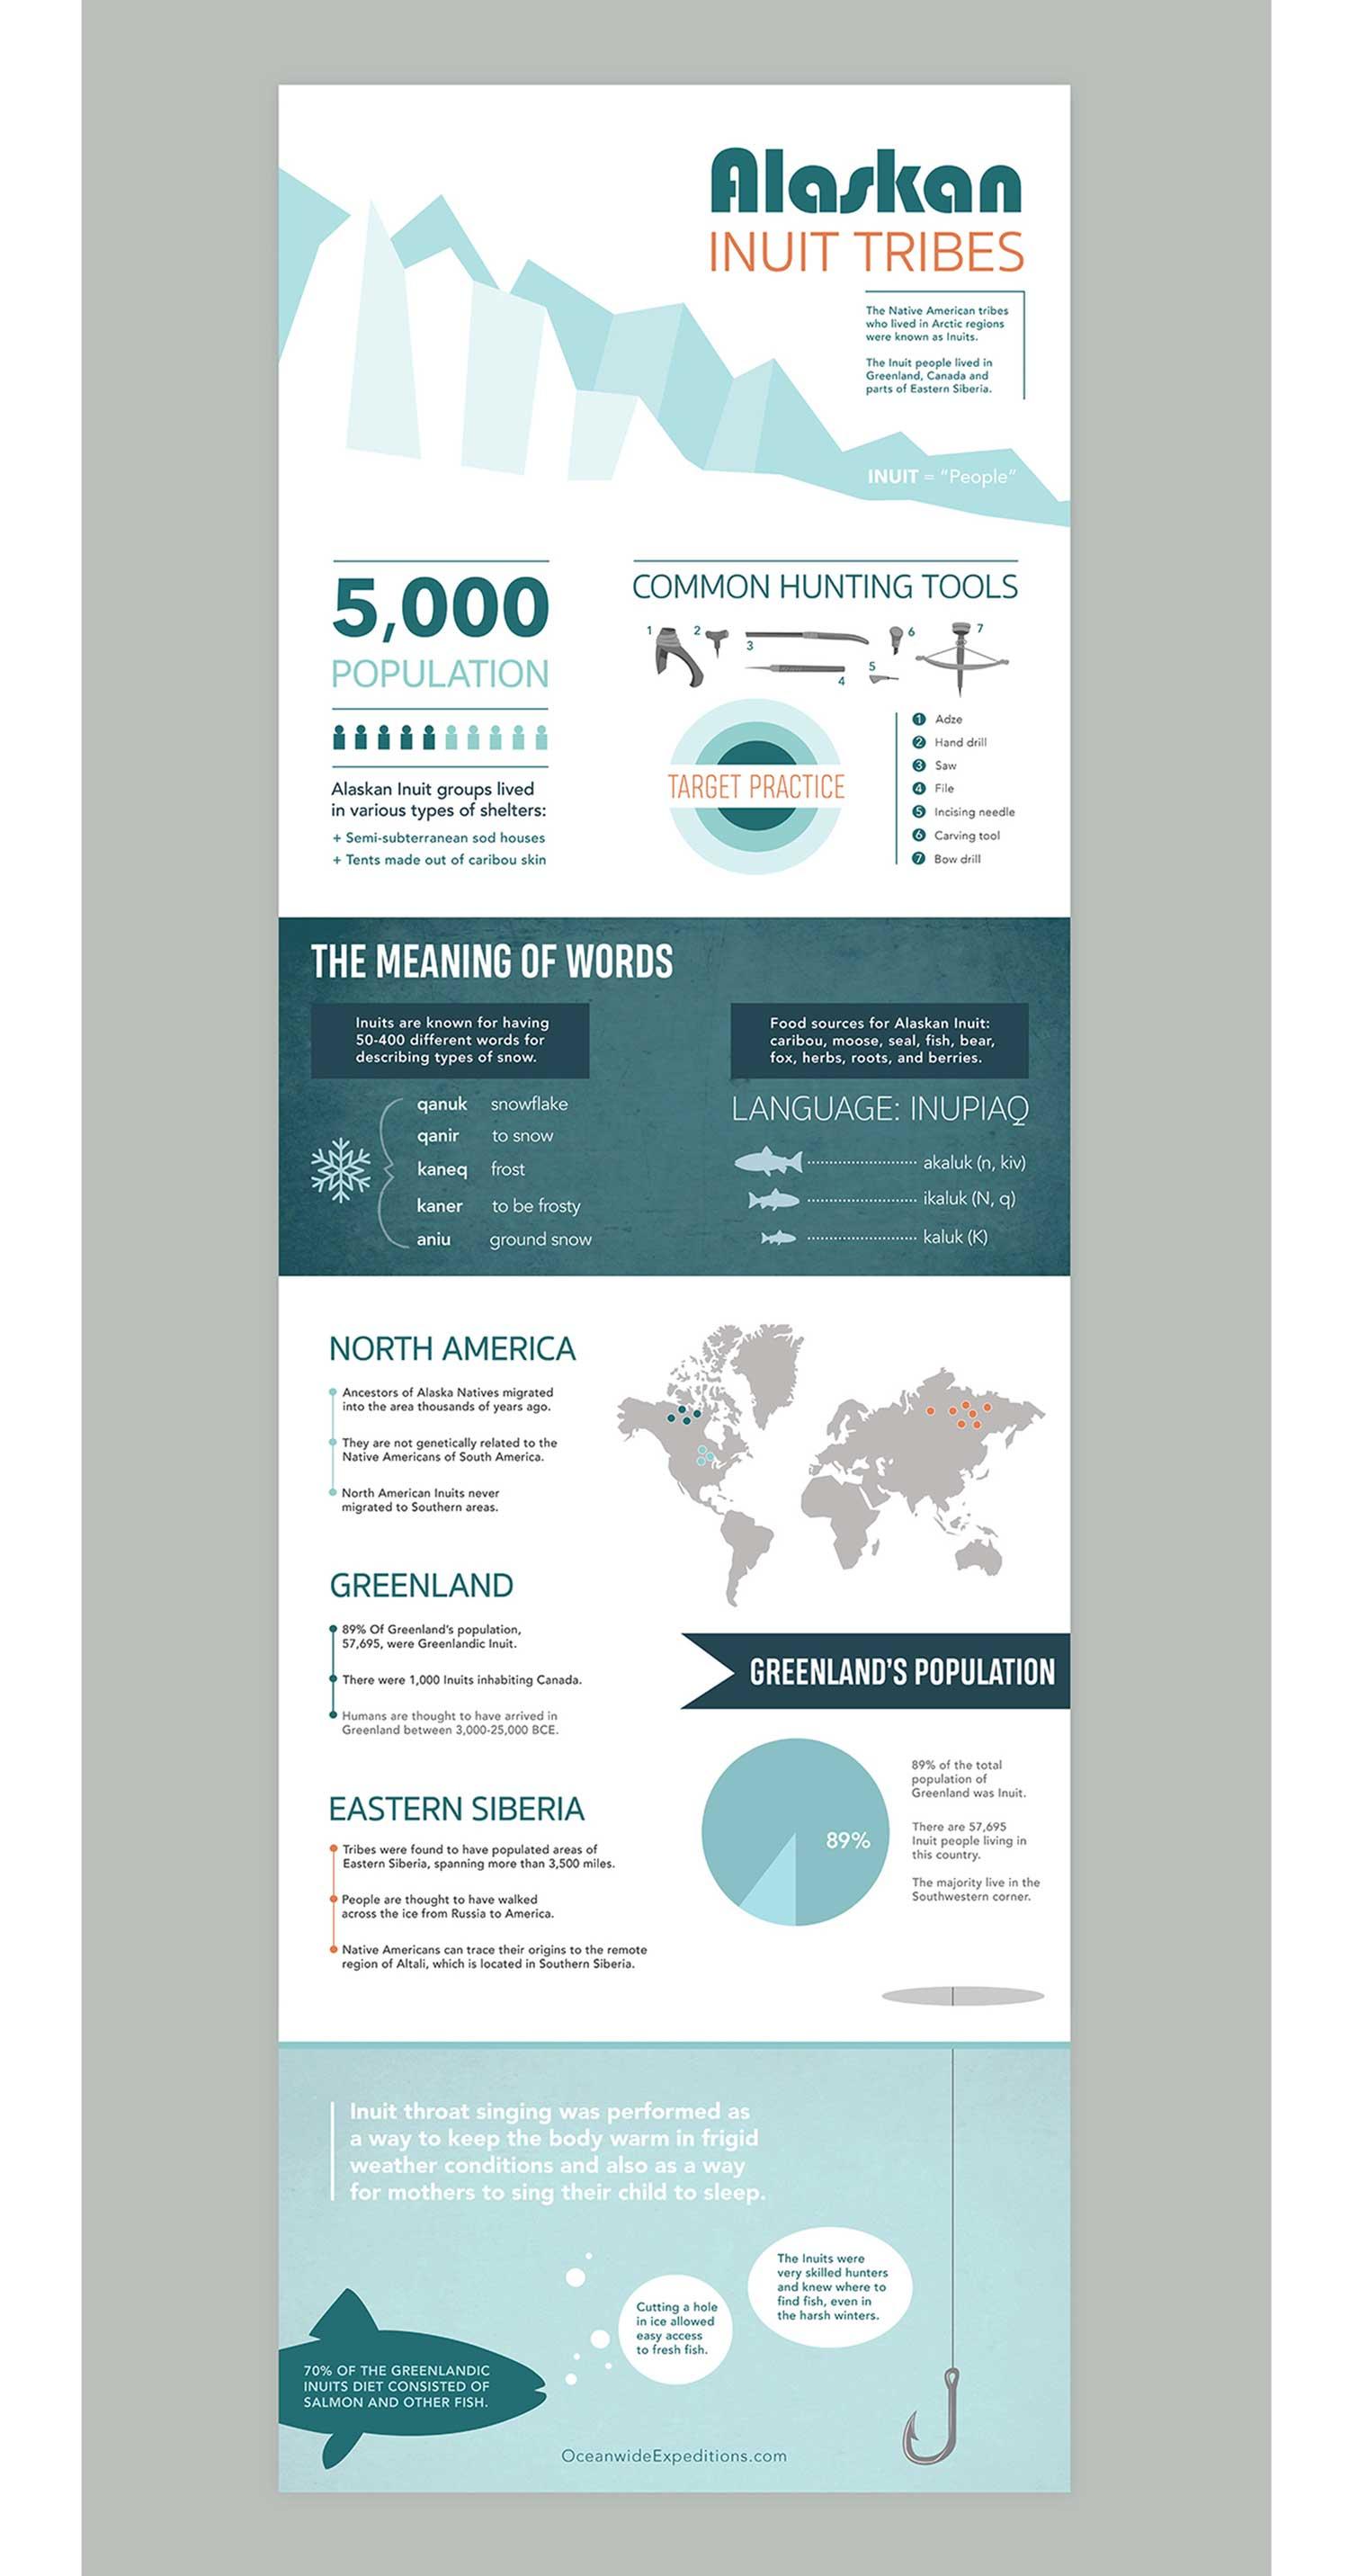 alaskan-infographic-optimized.jpg